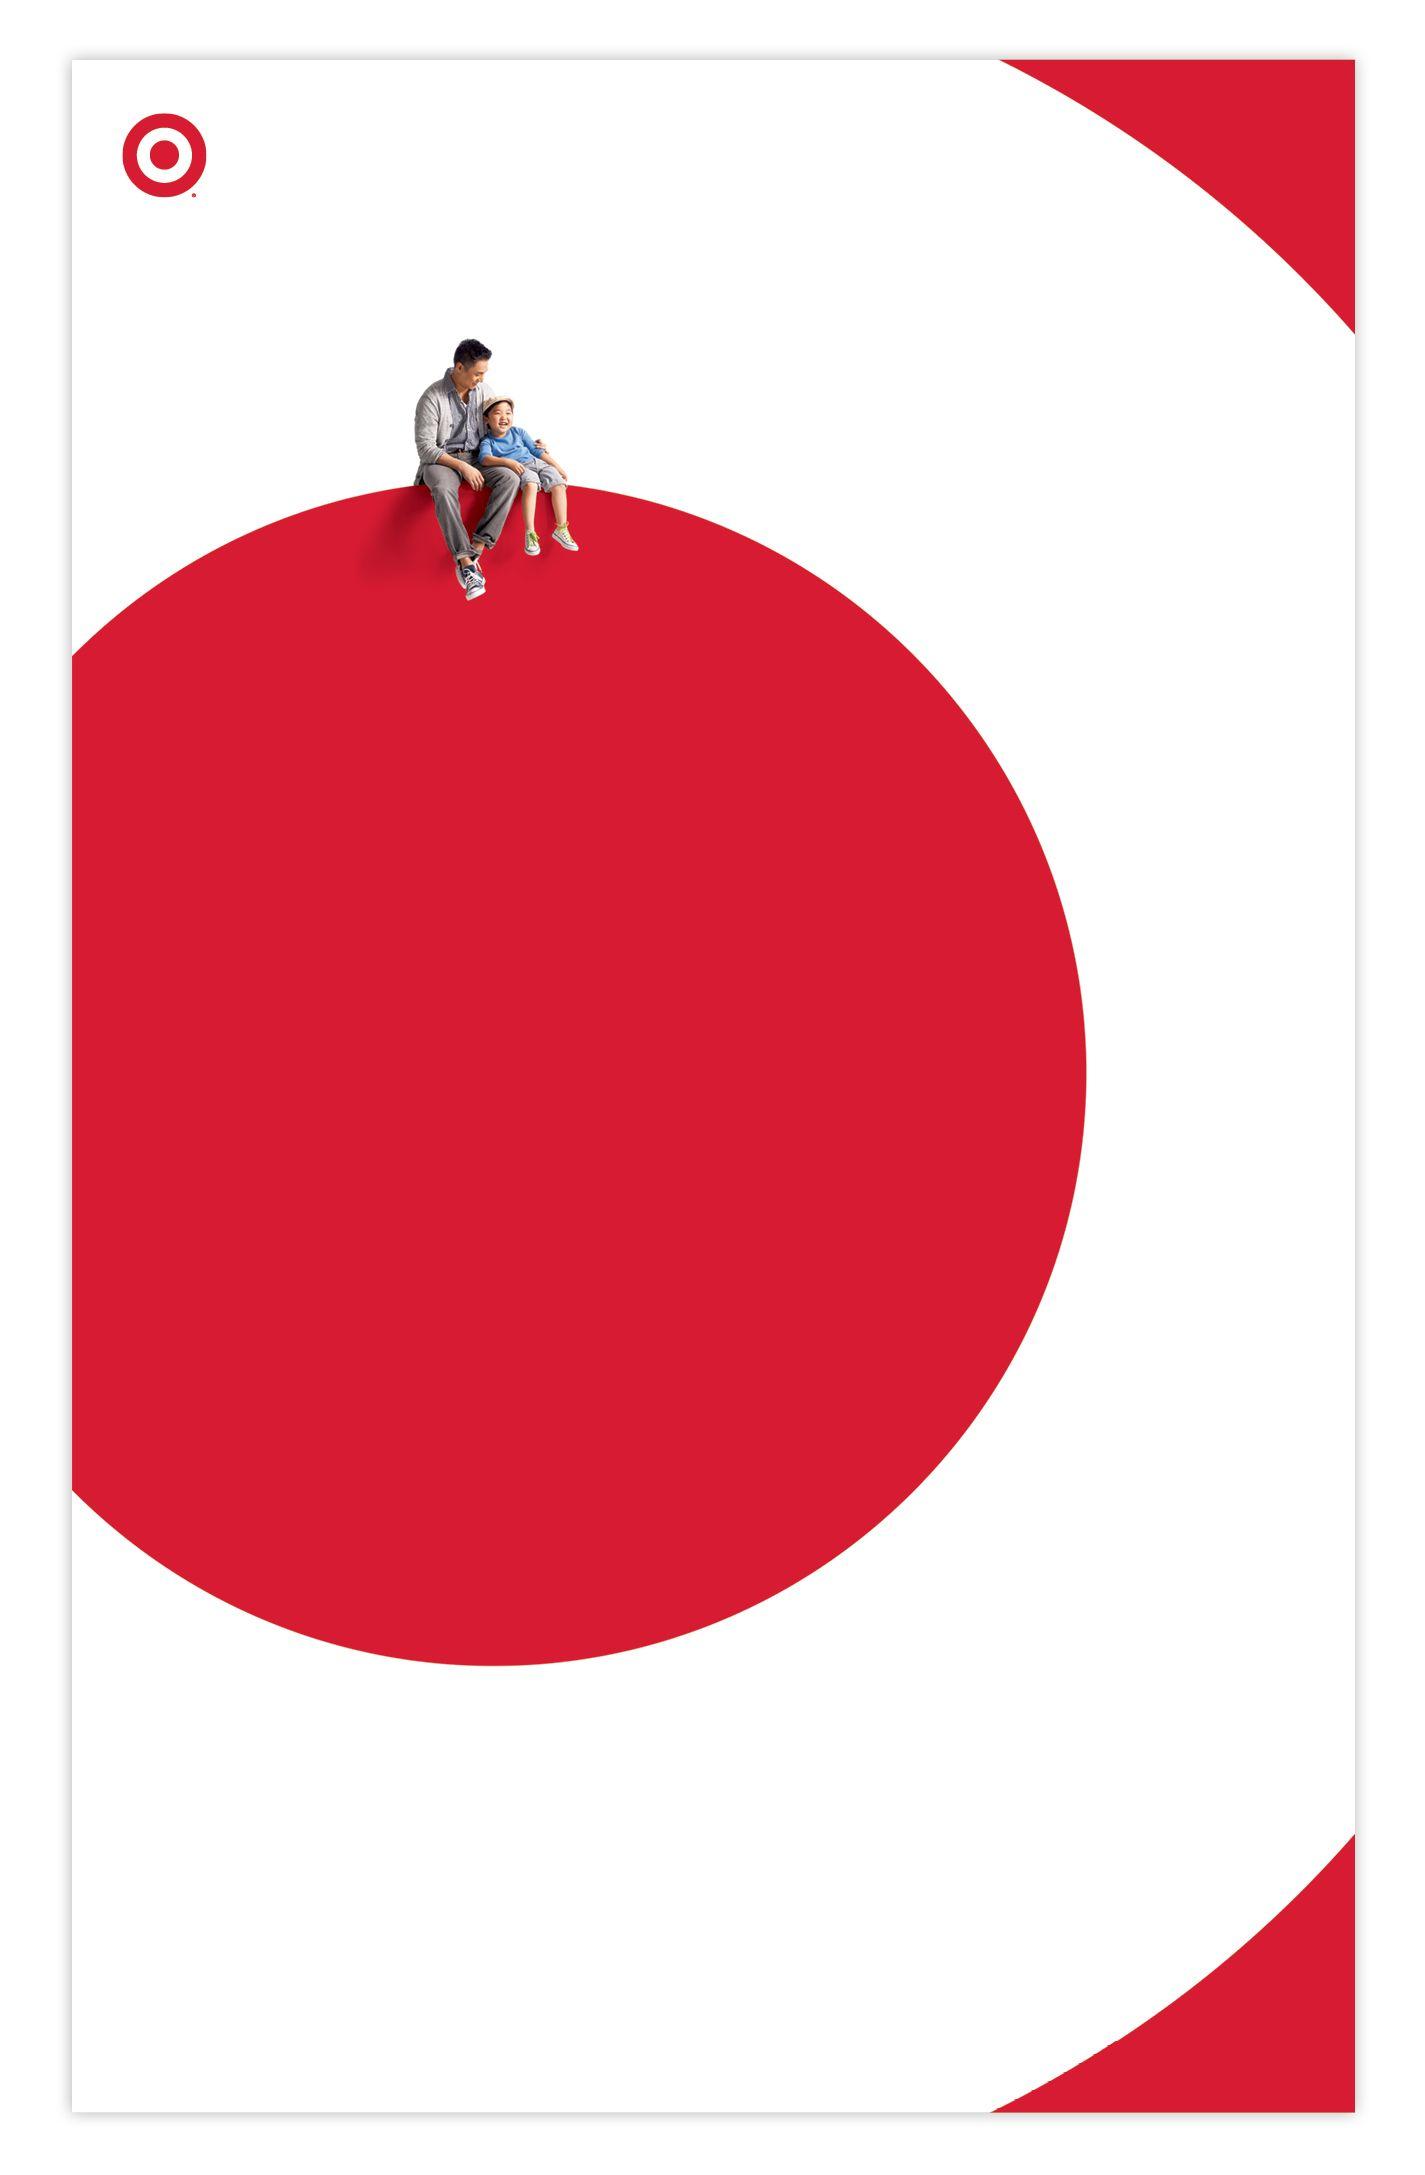 Target Branding 2011-14 - Allan Peters